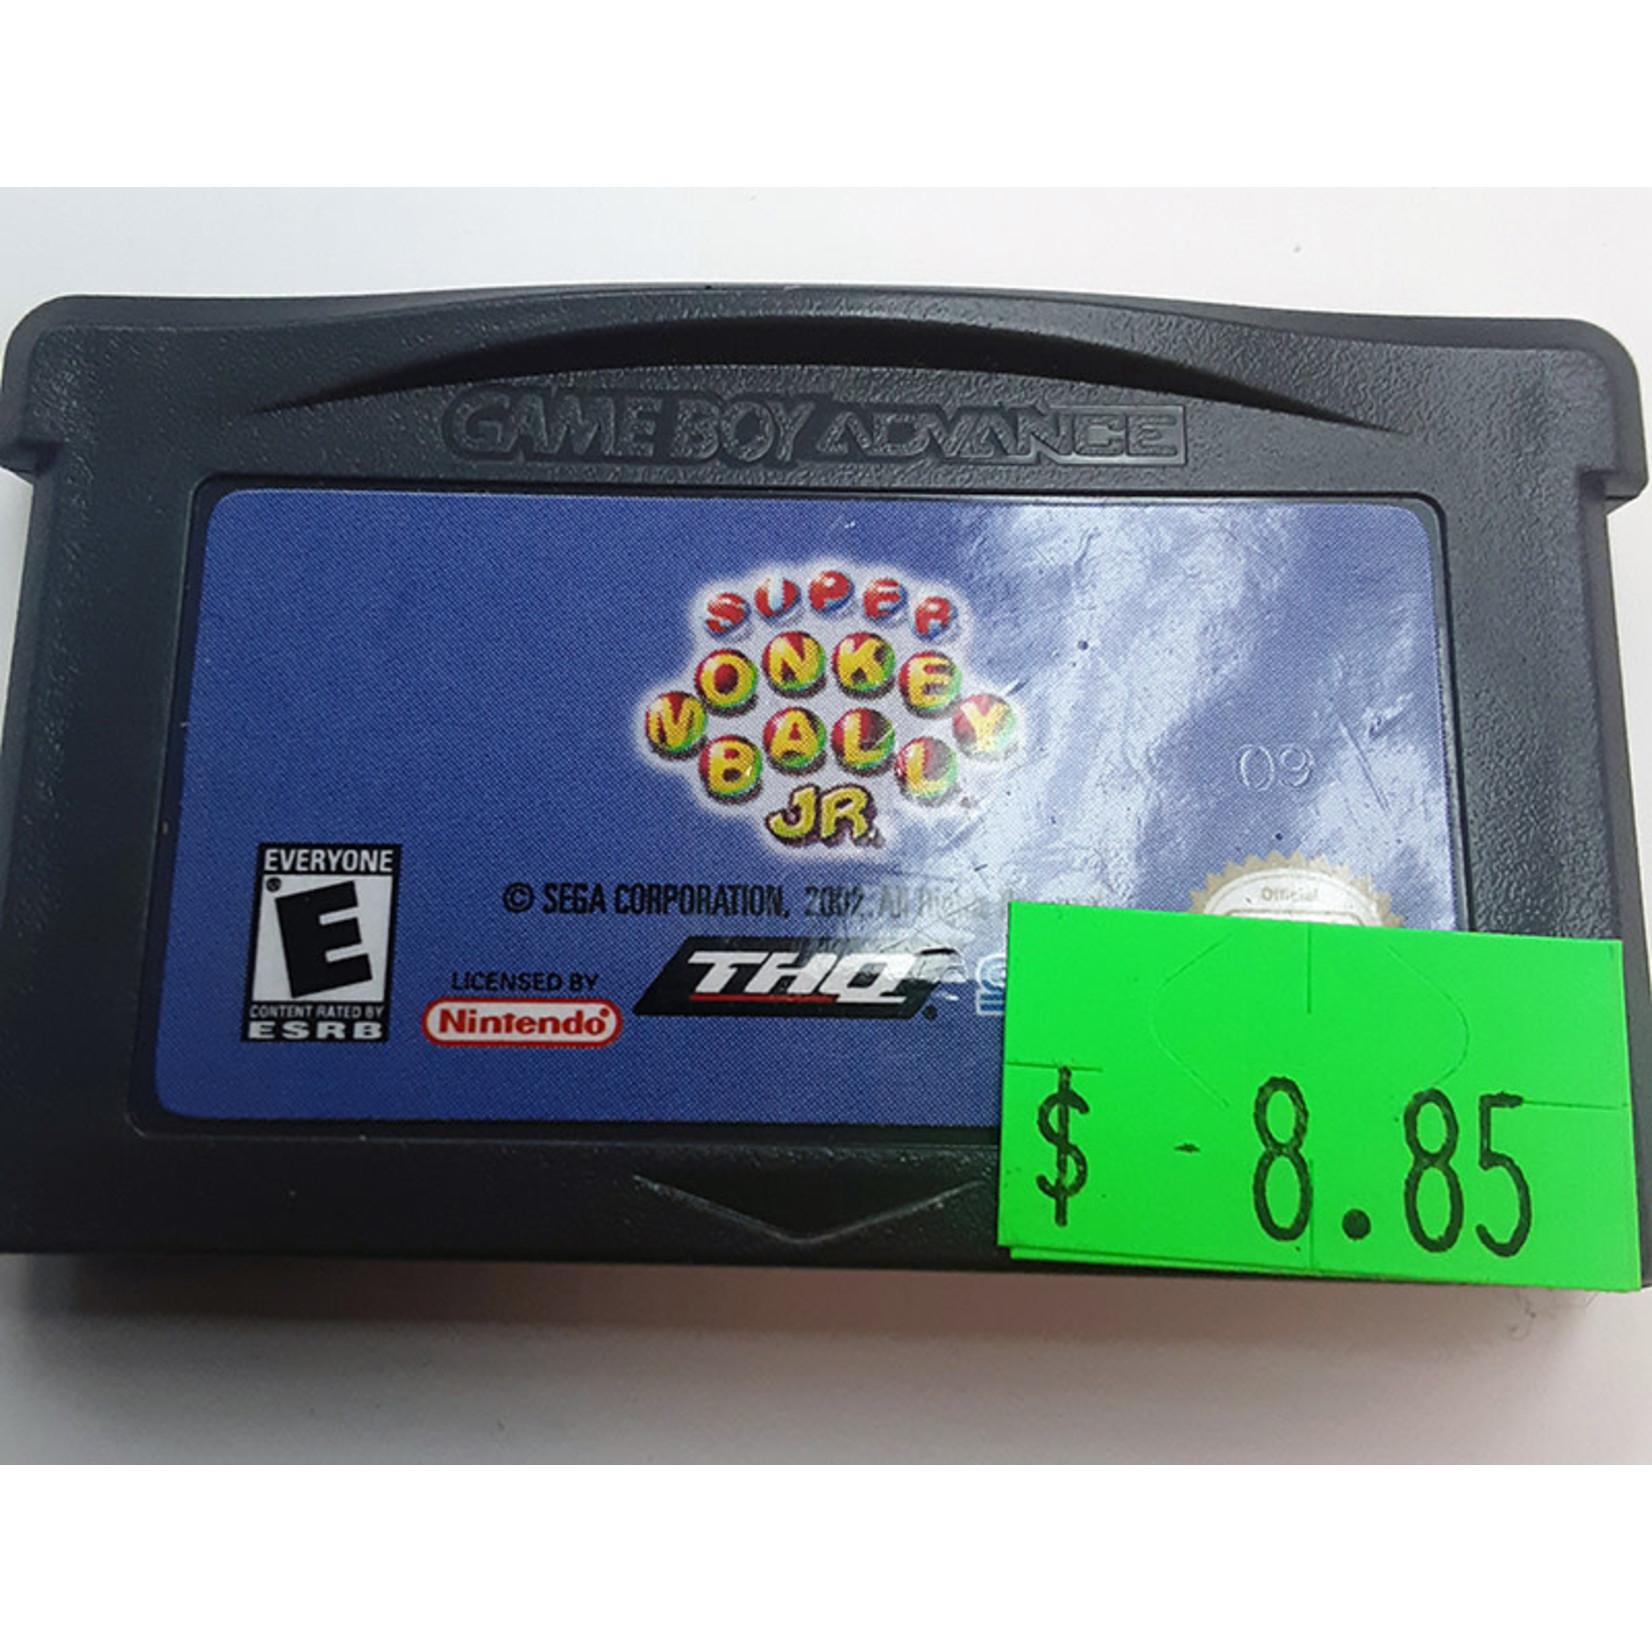 GBAu-Super Monkey Ball Jr (cartridge)